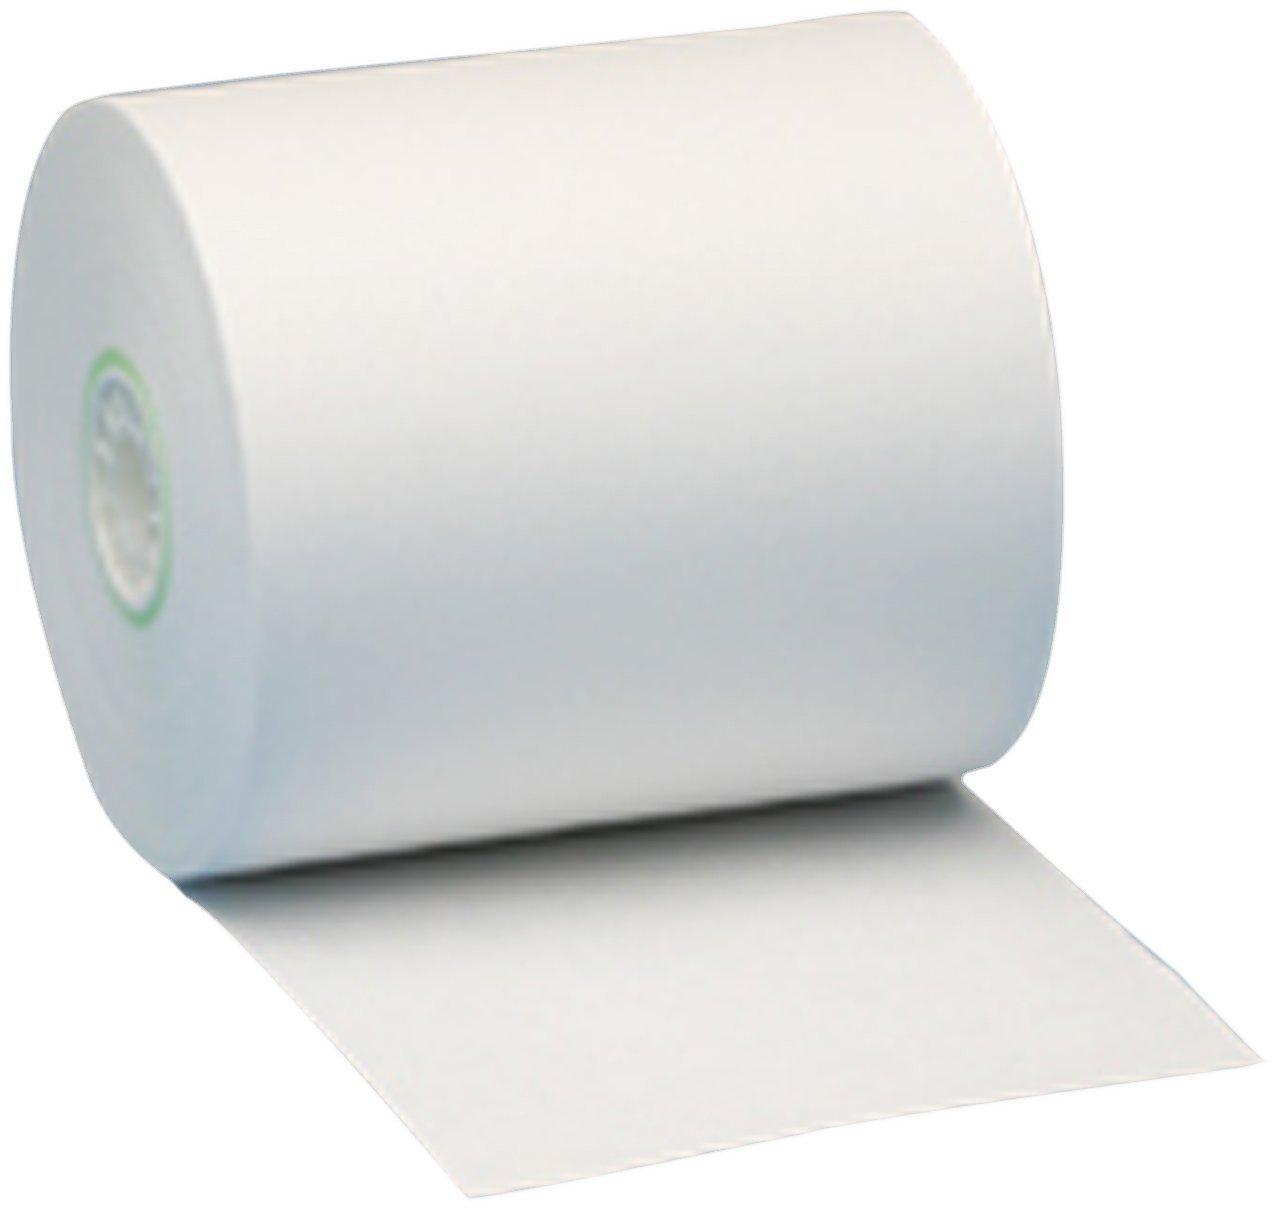 "Nashua 3-1/8"" x 220' Thermal Cash Register Receipt Paper, 50 Rolls"